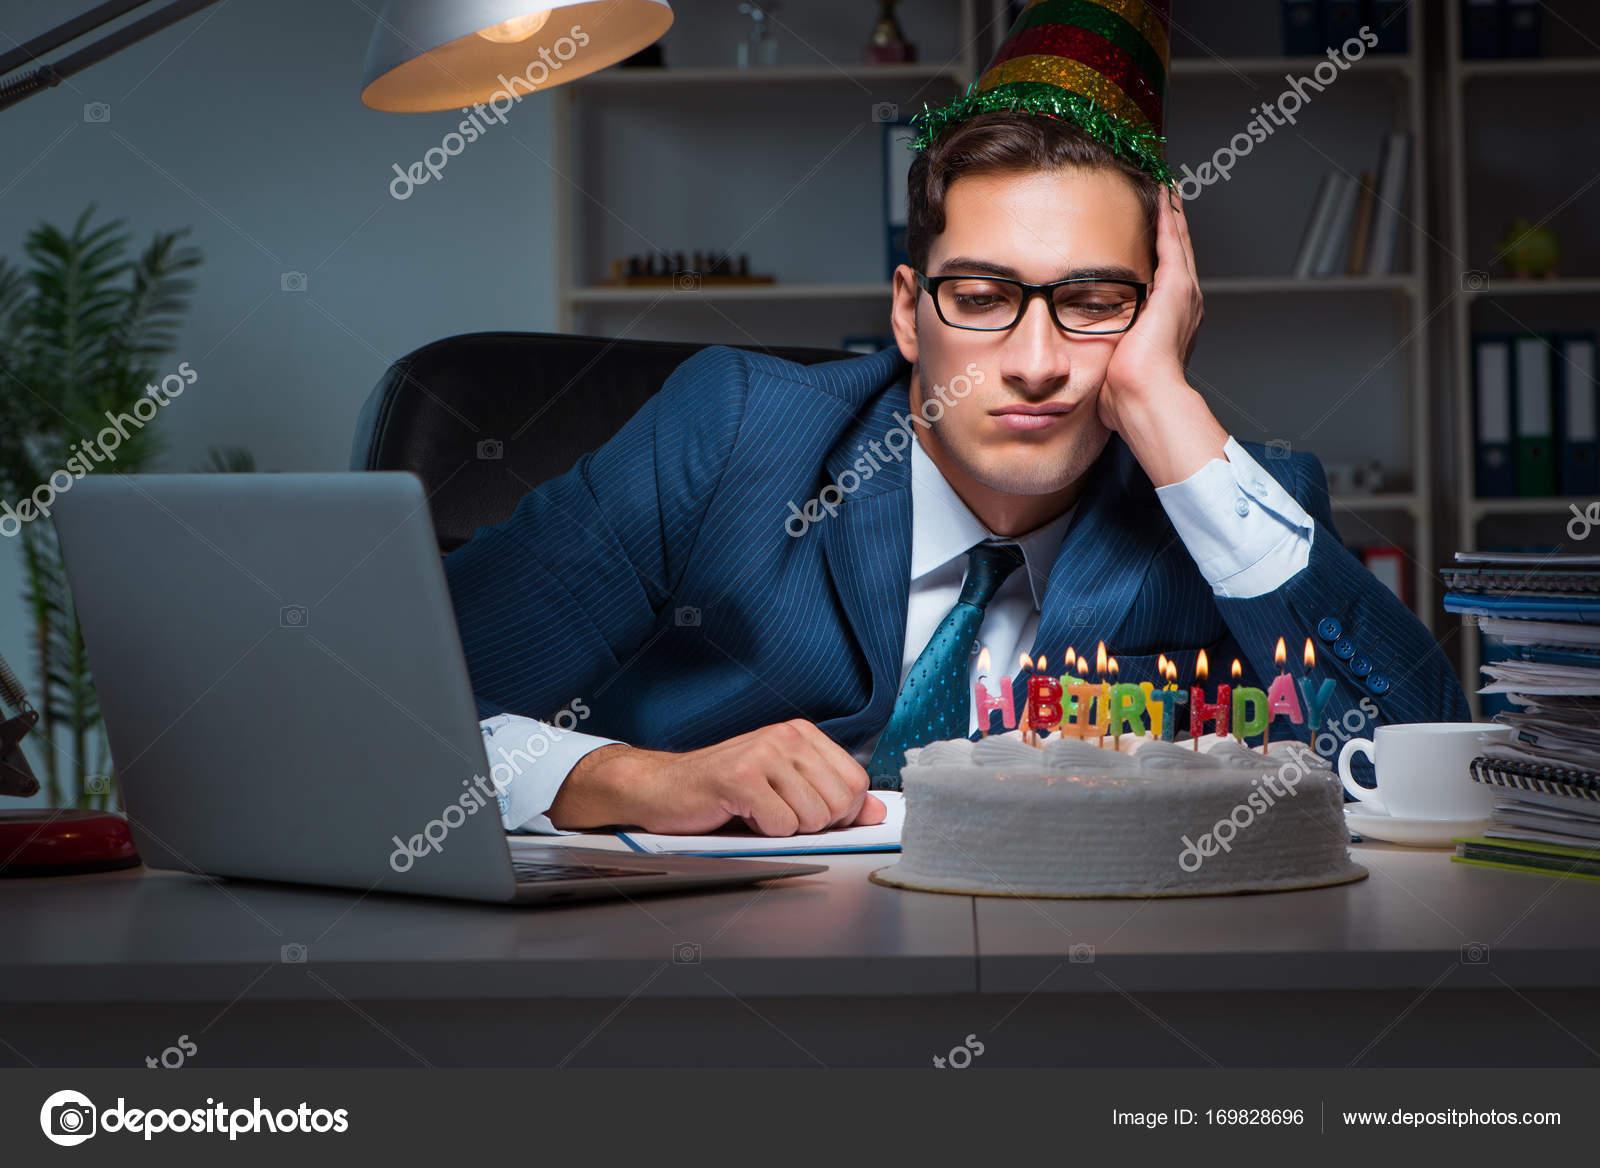 Cumpleanos Oficina Hombre Hombre Celebra Cumpleanos En La Oficina